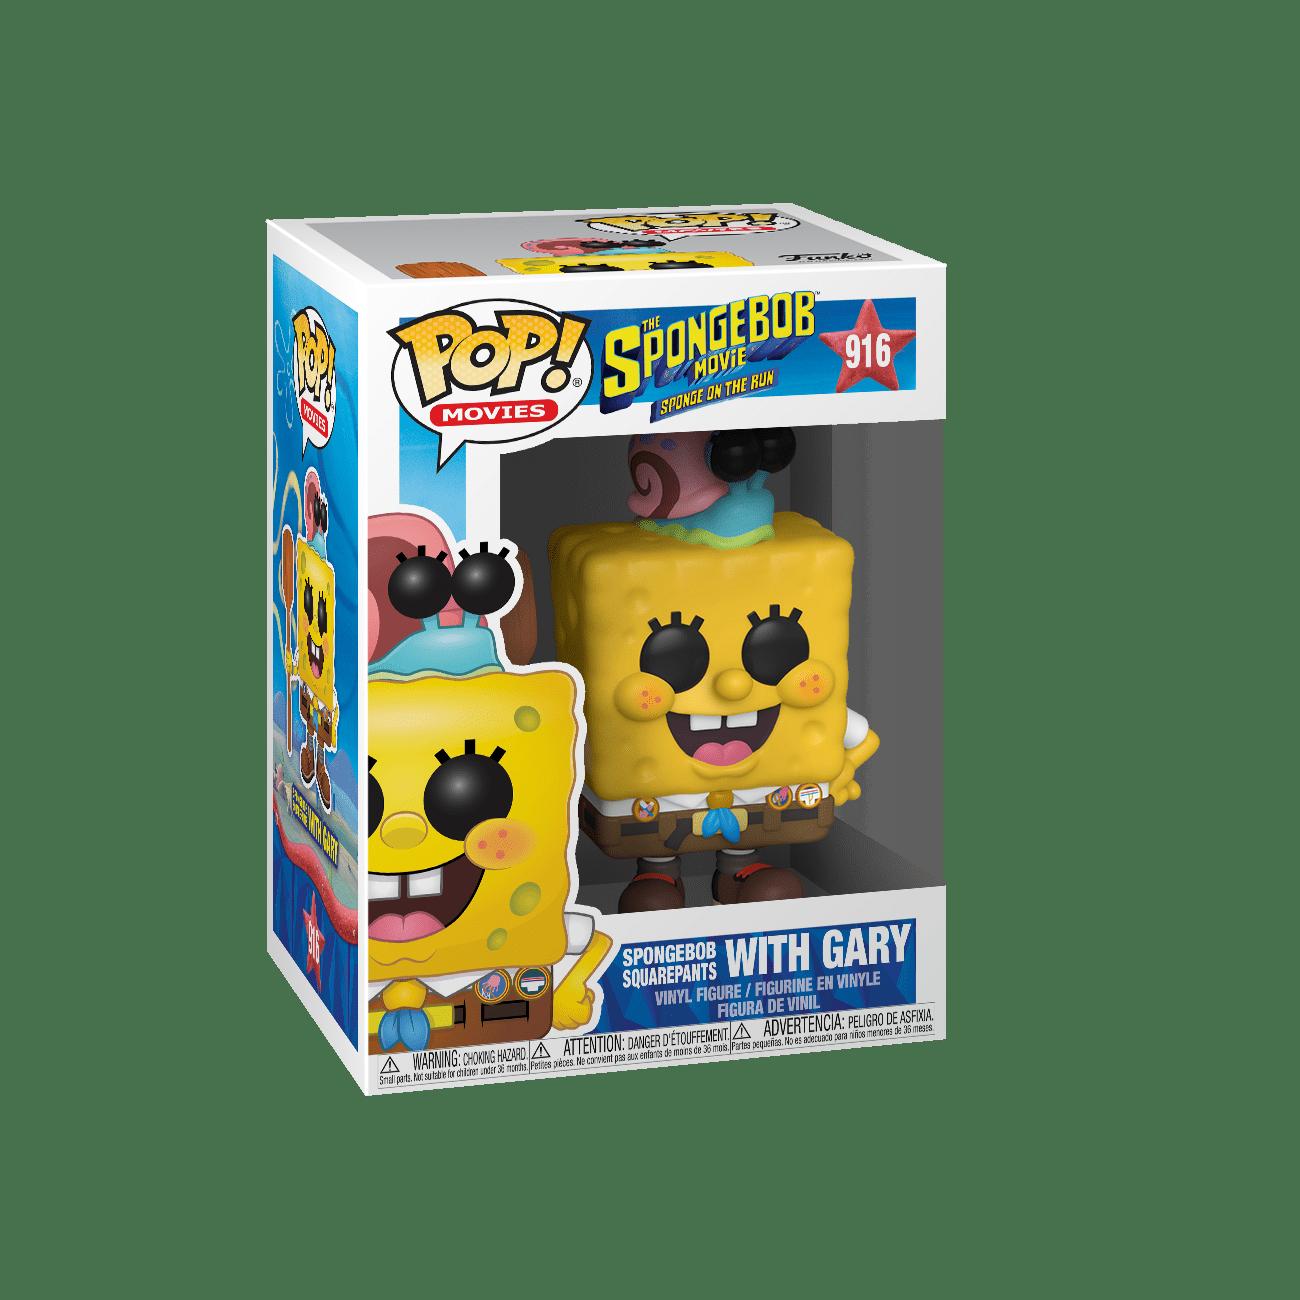 Funko POP! Sponge On The Run Spongebob Square Pants With Gary #916